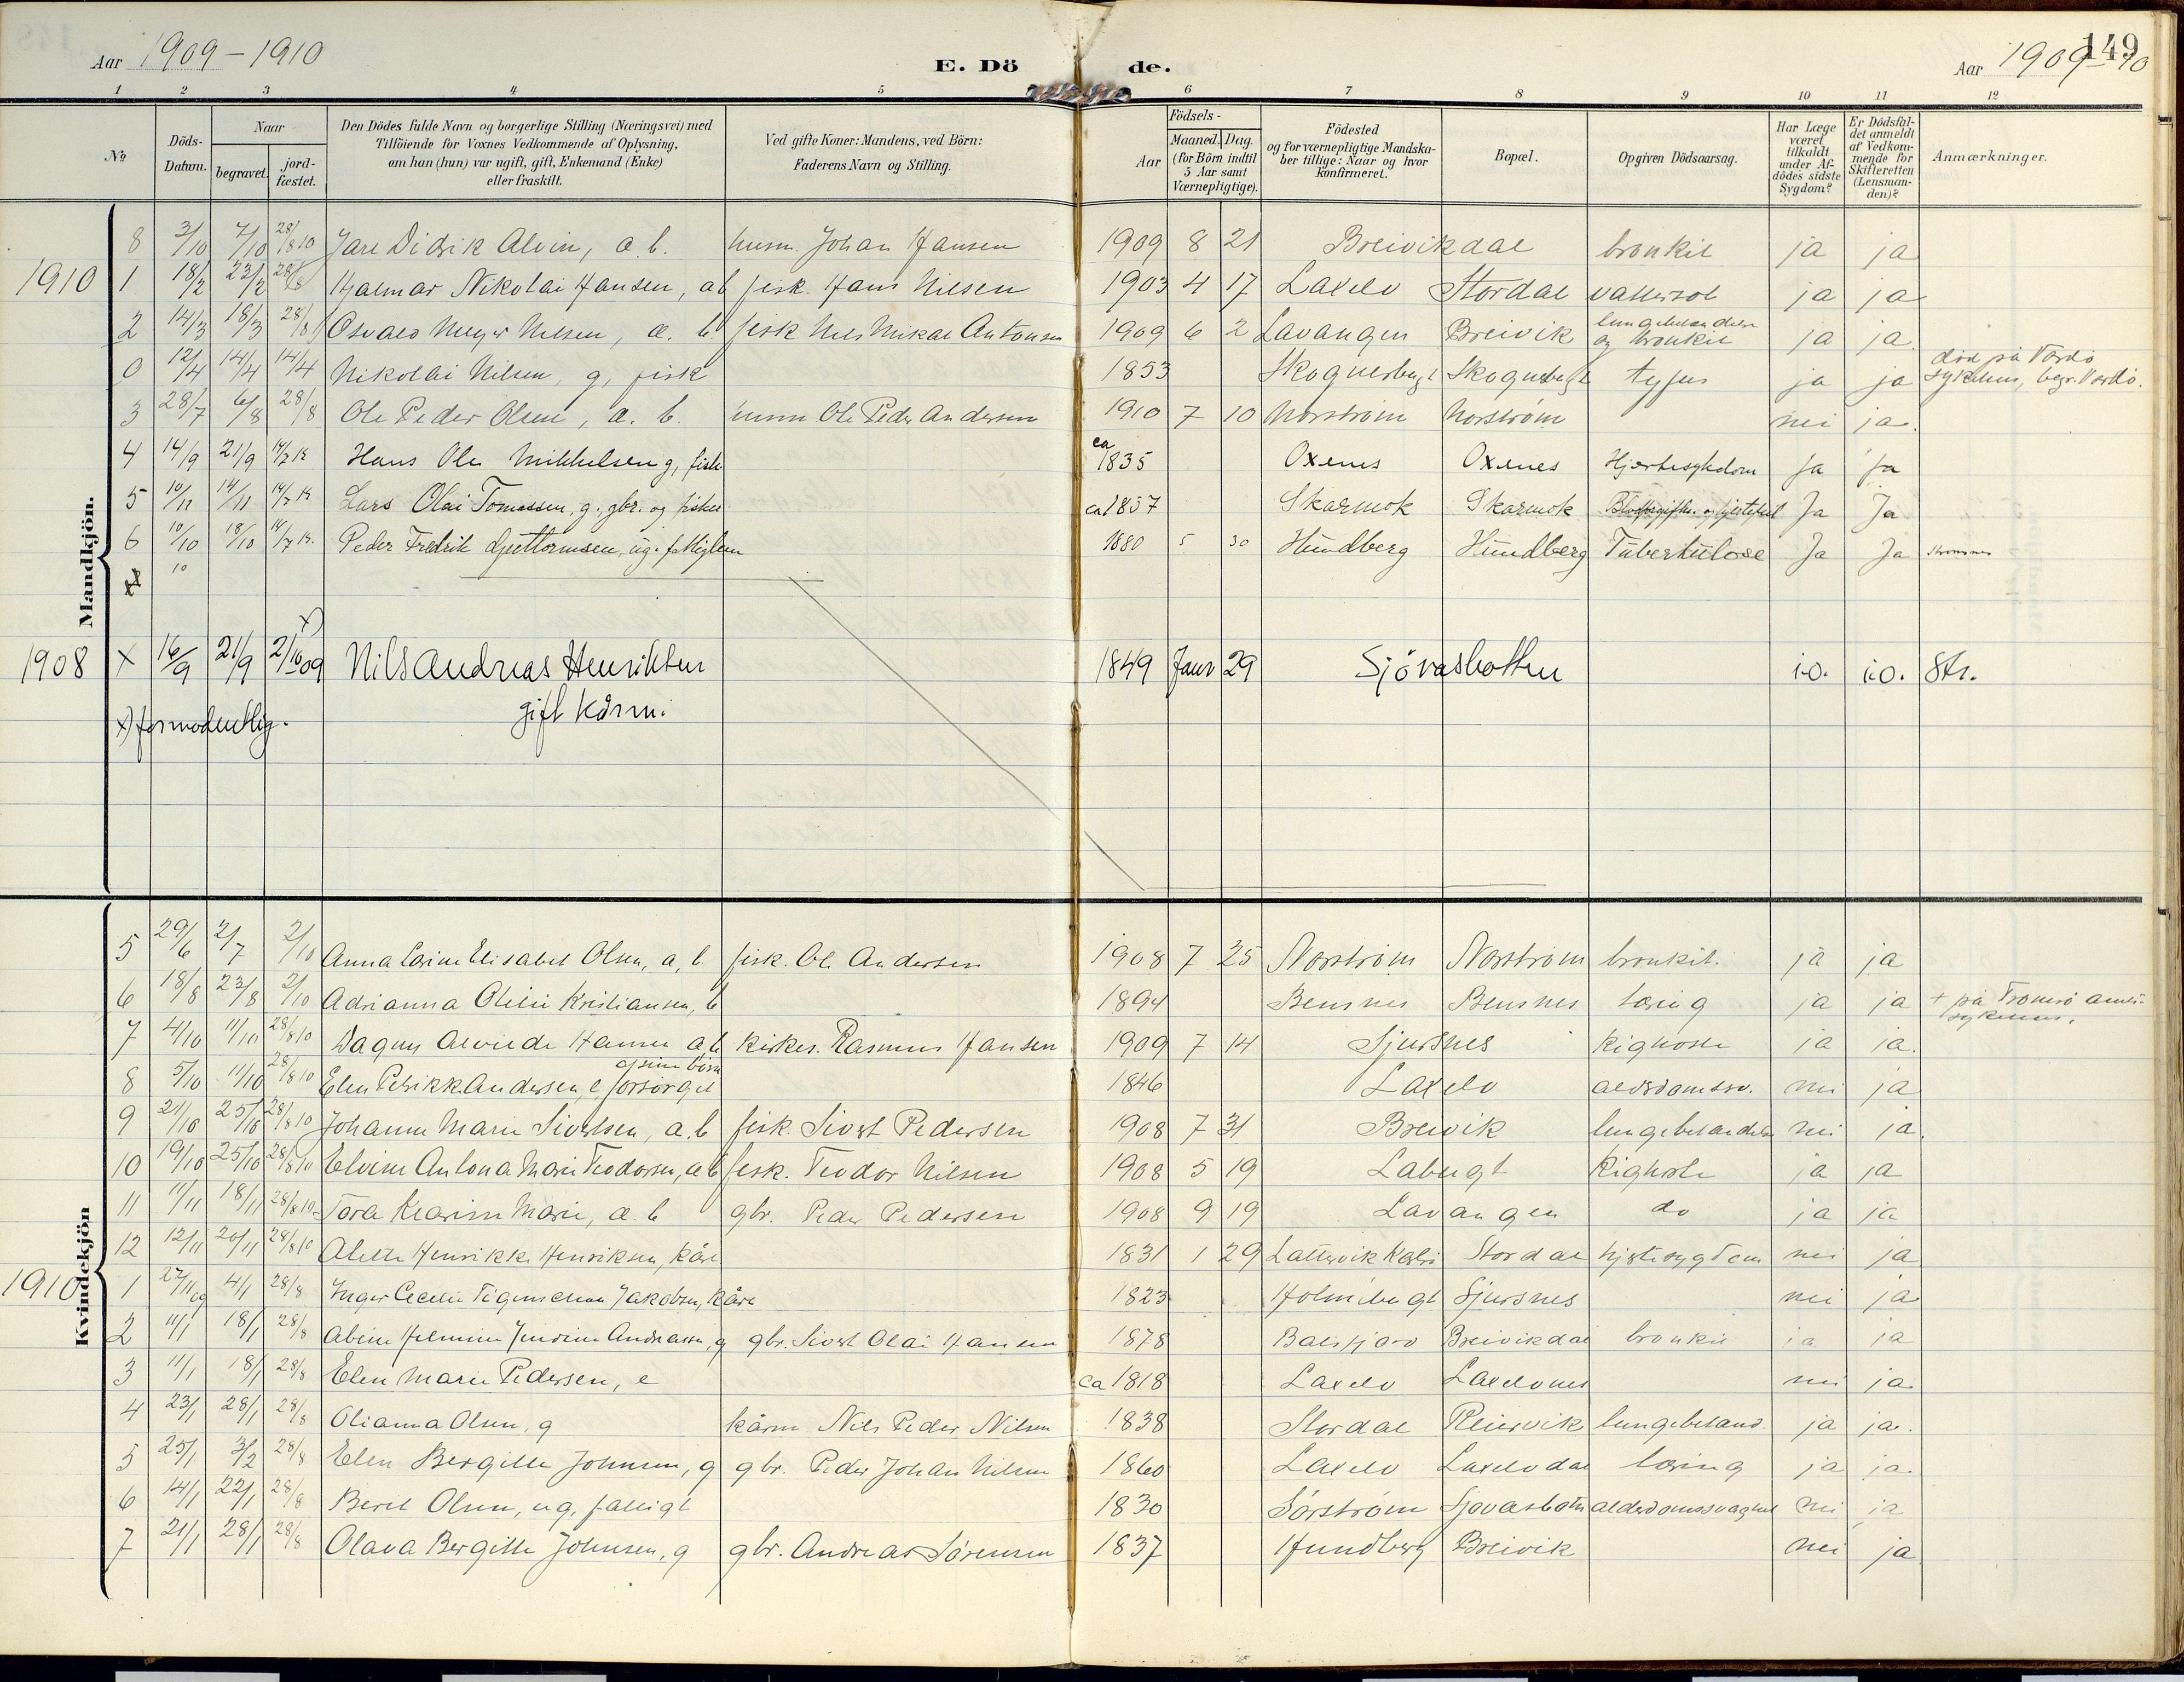 SATØ, Lyngen sokneprestembete, Ministerialbok nr. 14, 1905-1920, s. 149